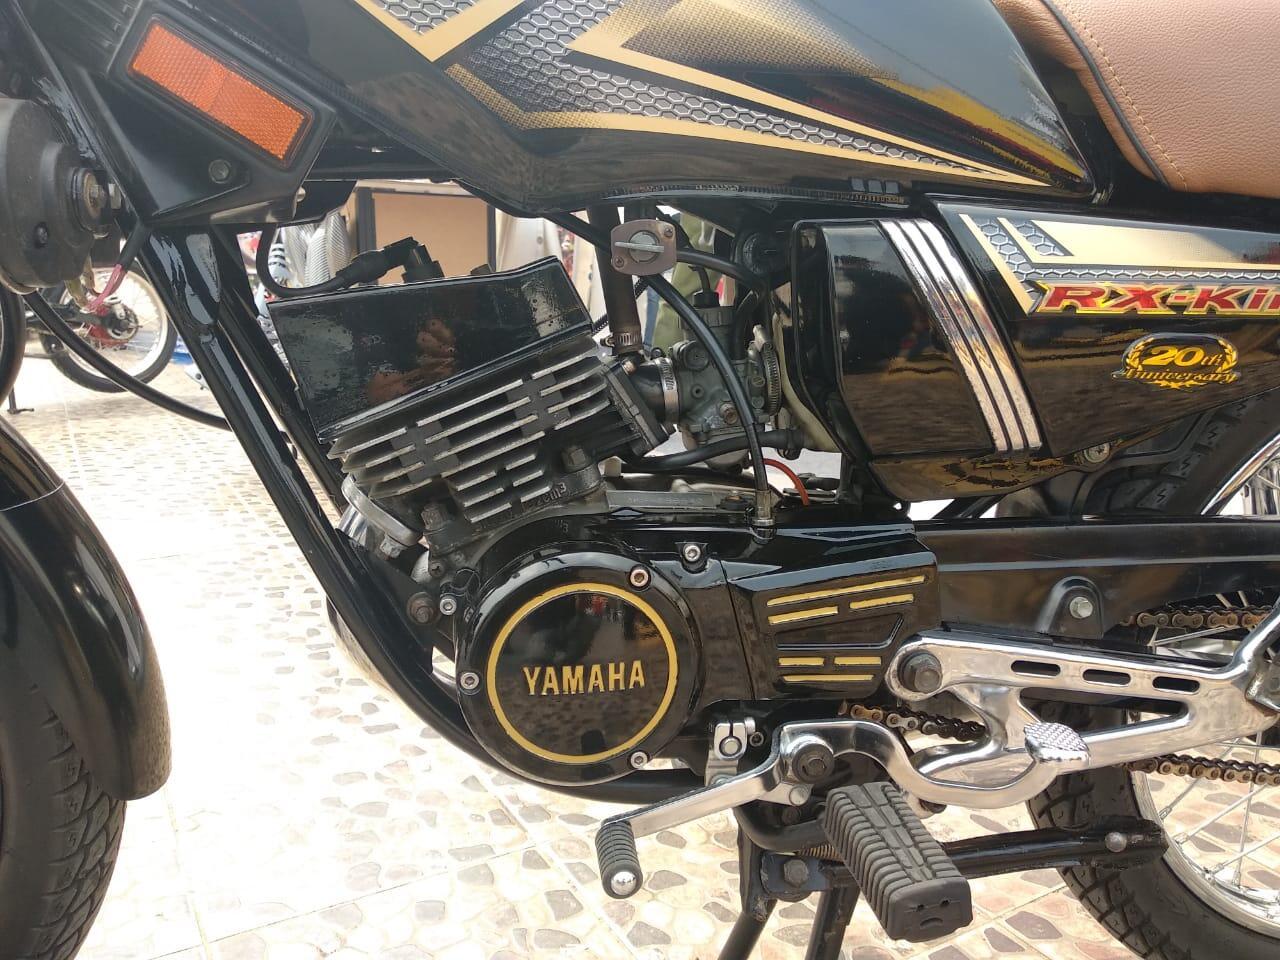 Ada Ya Maling Seperti Ini, Yamaha RX King Ini Jadi Korban Tapi Mesin Aja Yang Dicuri